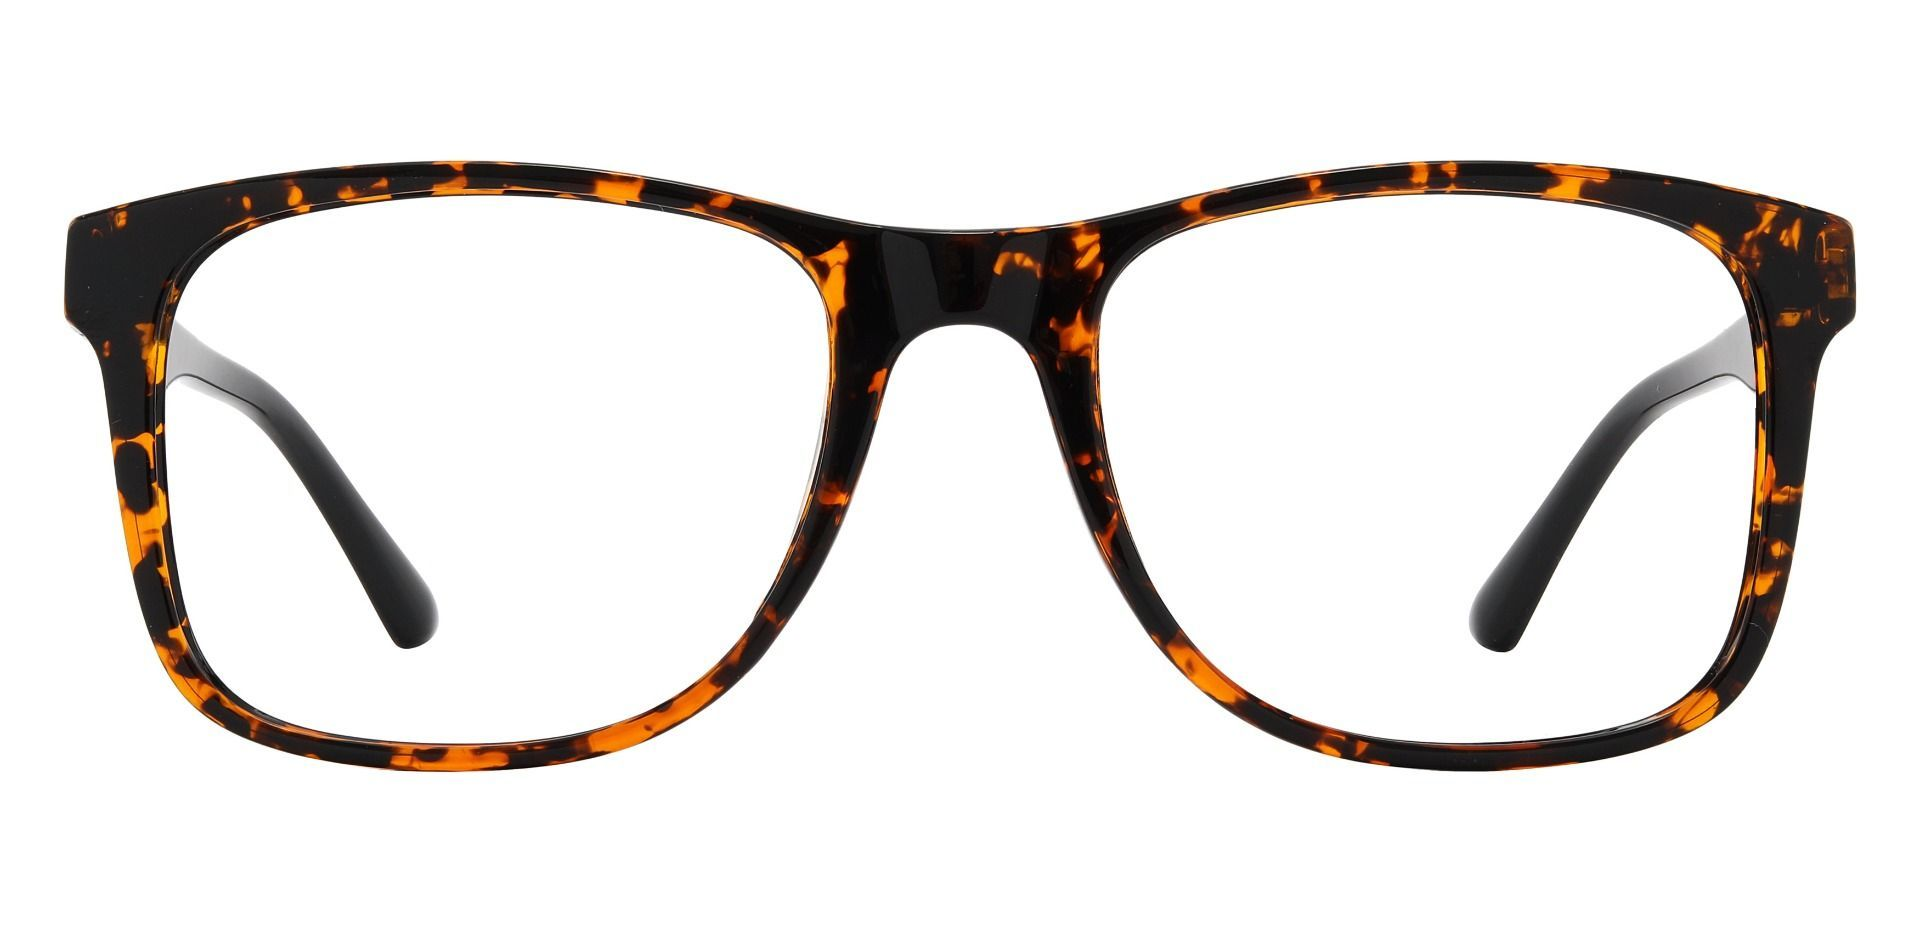 Osage Square Prescription Glasses - Tortoise